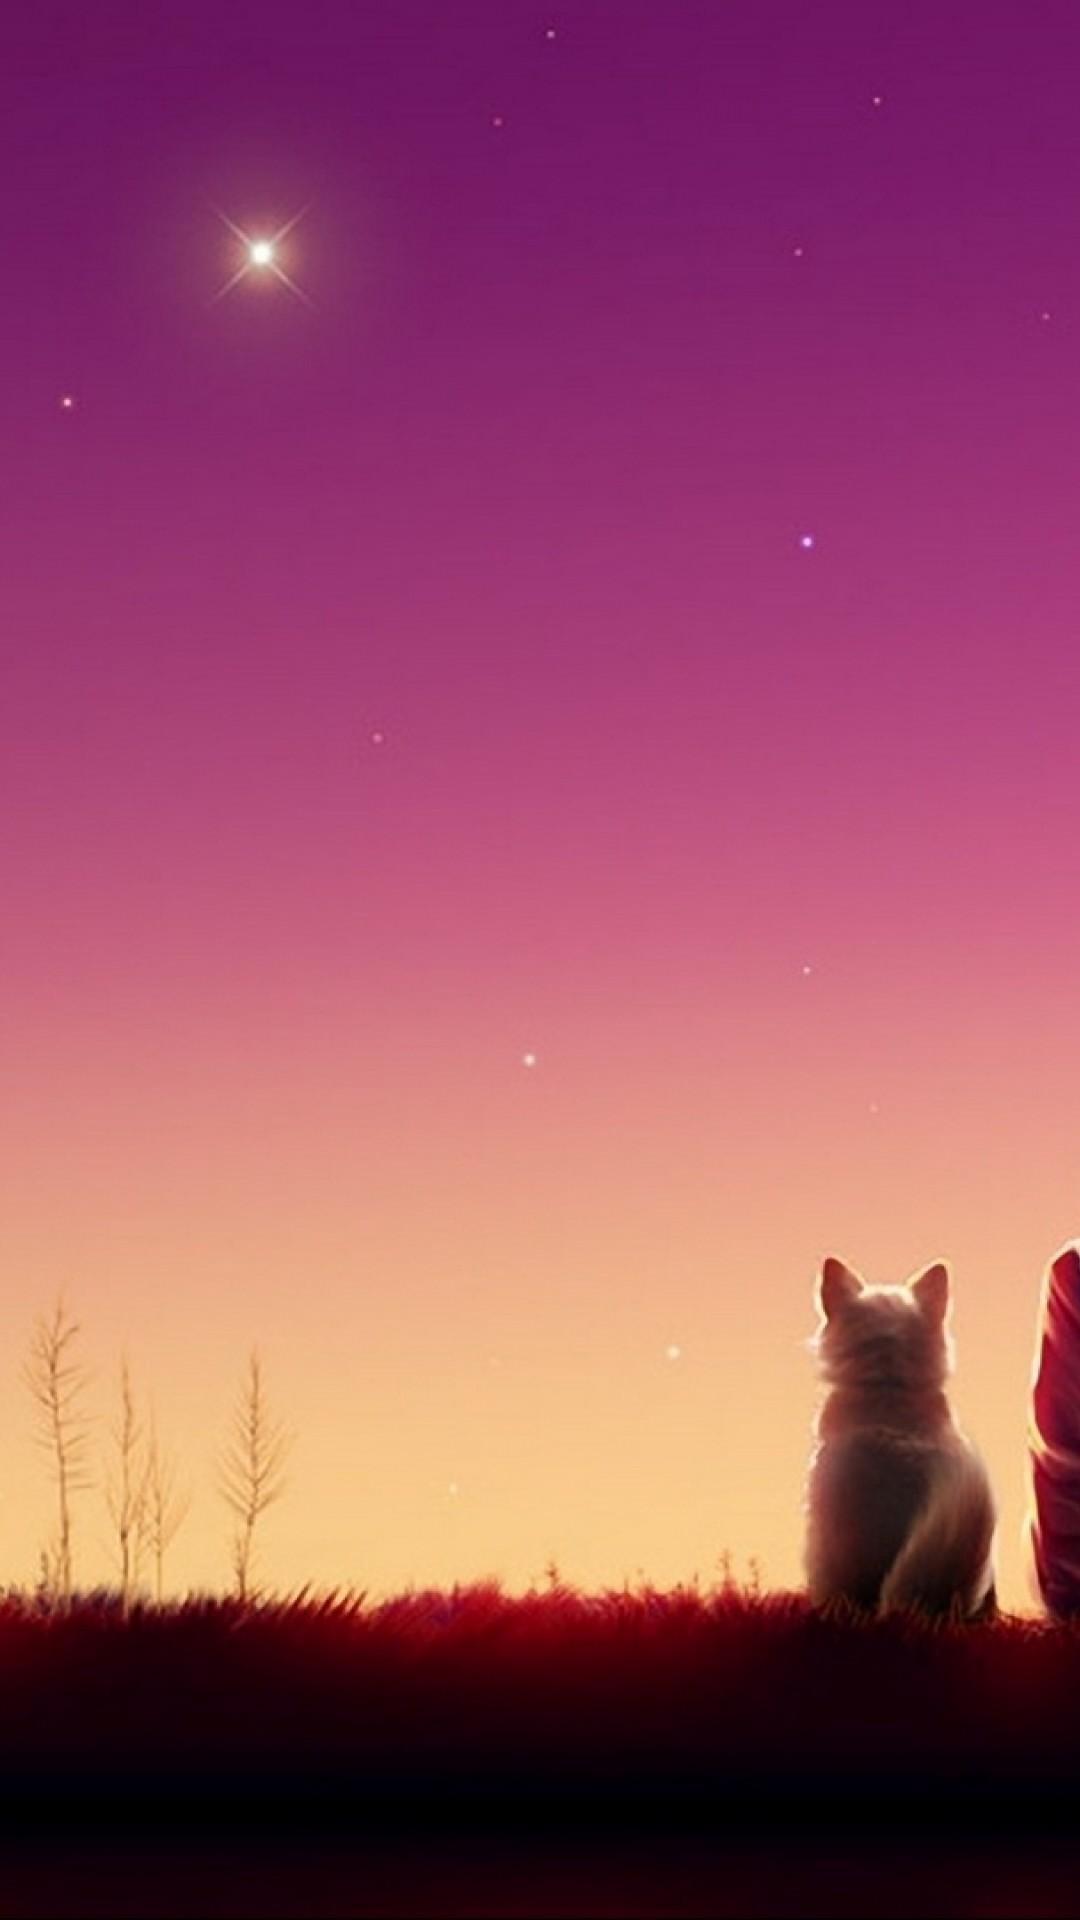 Anime Cat Wallpaper Hd 1080x1920 Download Hd Wallpaper Wallpapertip